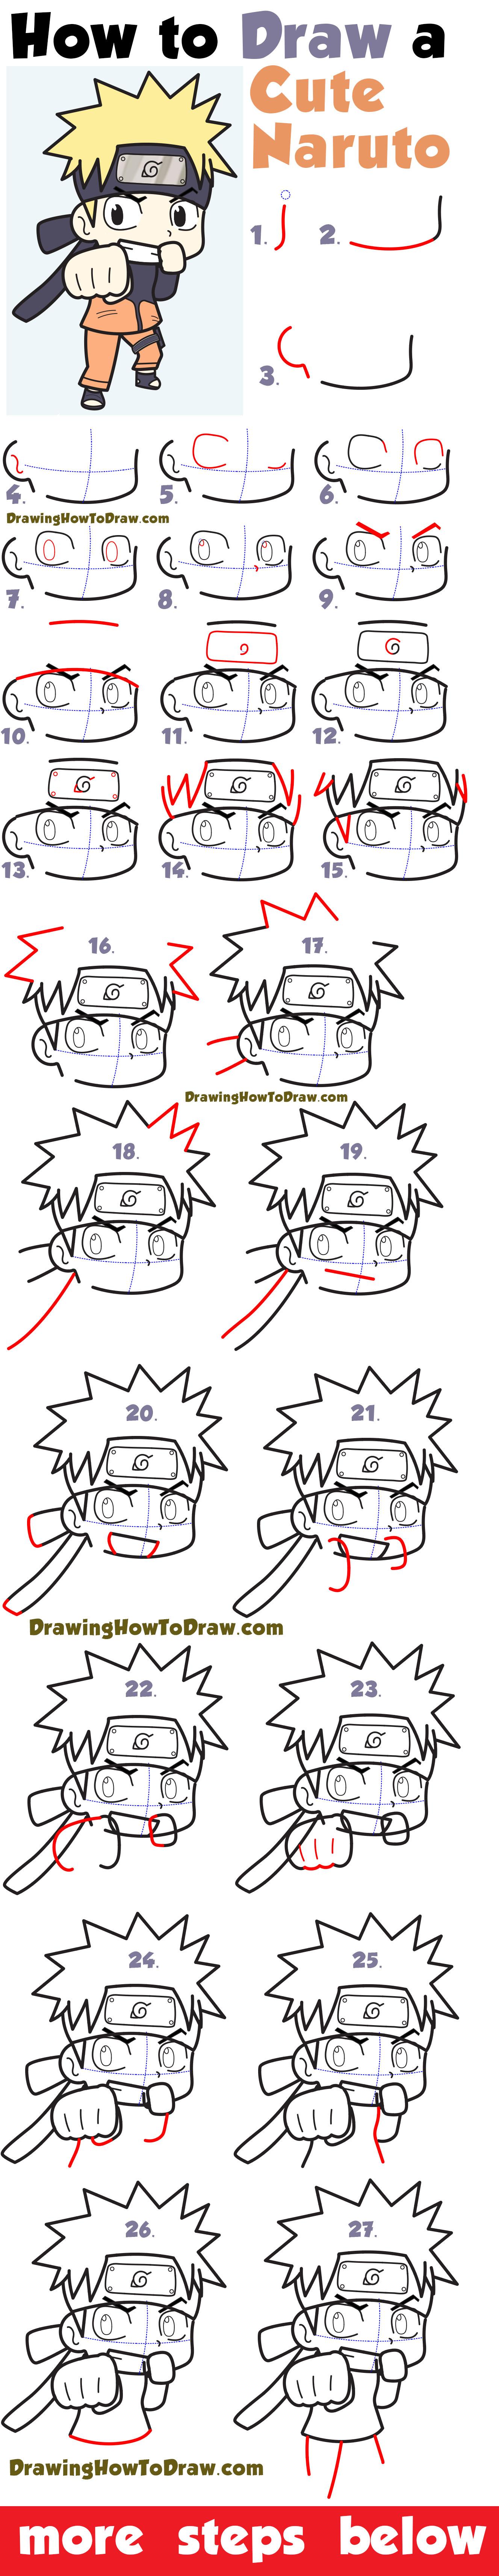 Chibi Naruto Drawing Easy Novocom Top